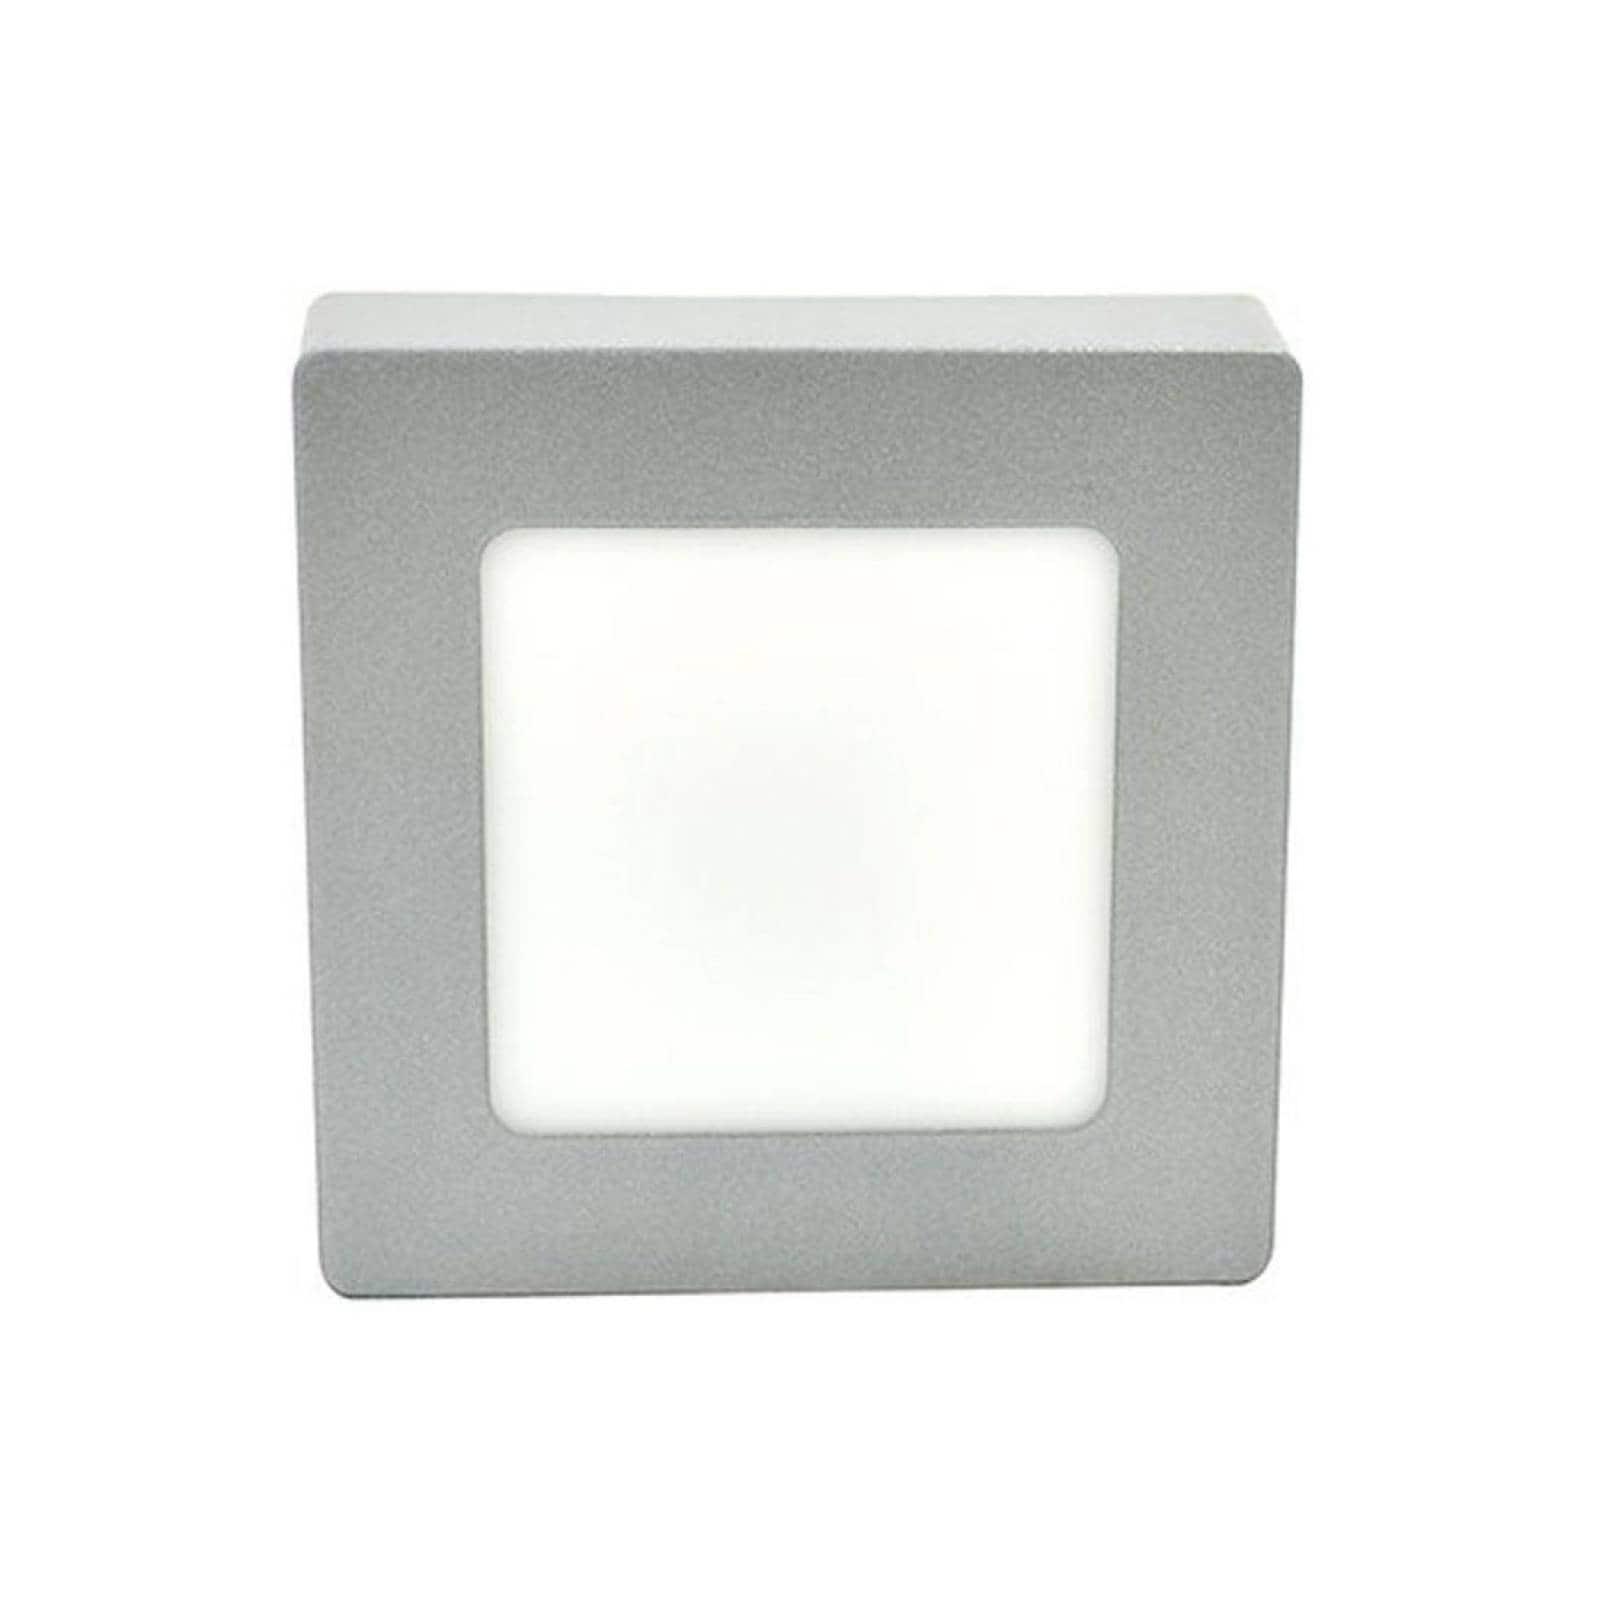 Tapa Luminario Cuadrada Sobreponer Blanco Ad-5464 6W Adir